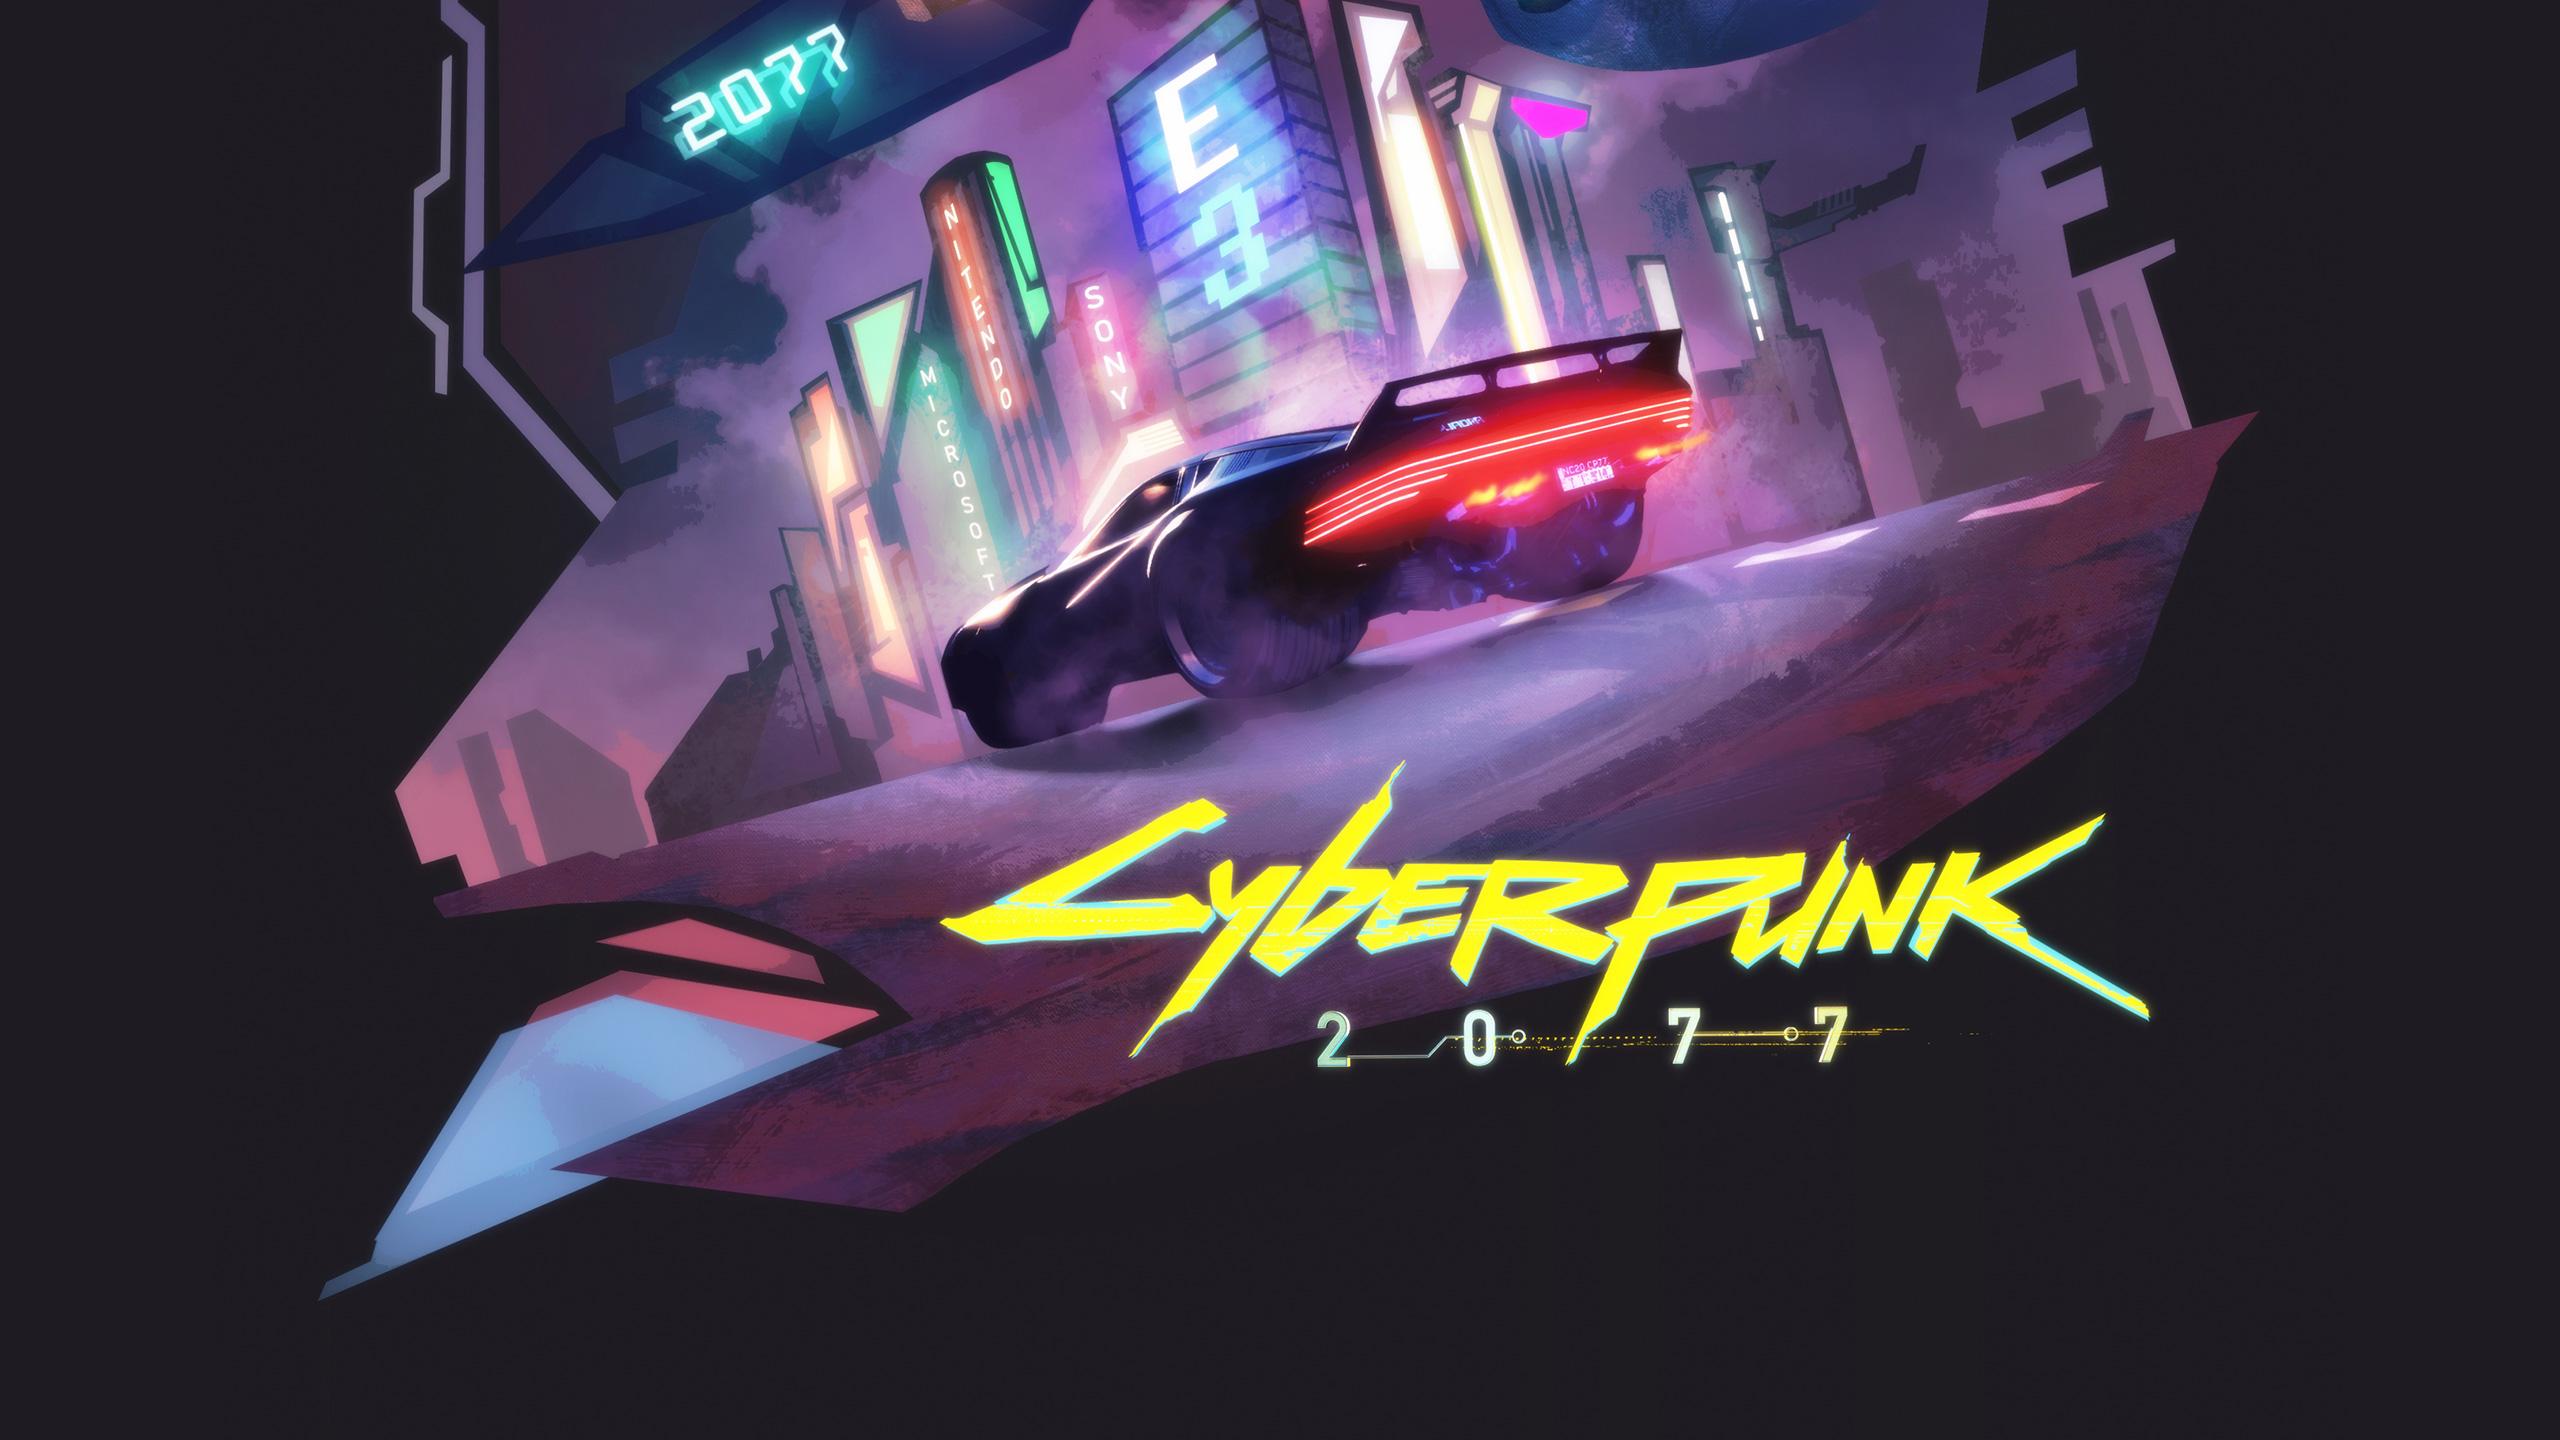 Cyberpunk 2077 Wallpapers Hd: Cyberpunk 2077 Game Fanart, HD Games, 4k Wallpapers